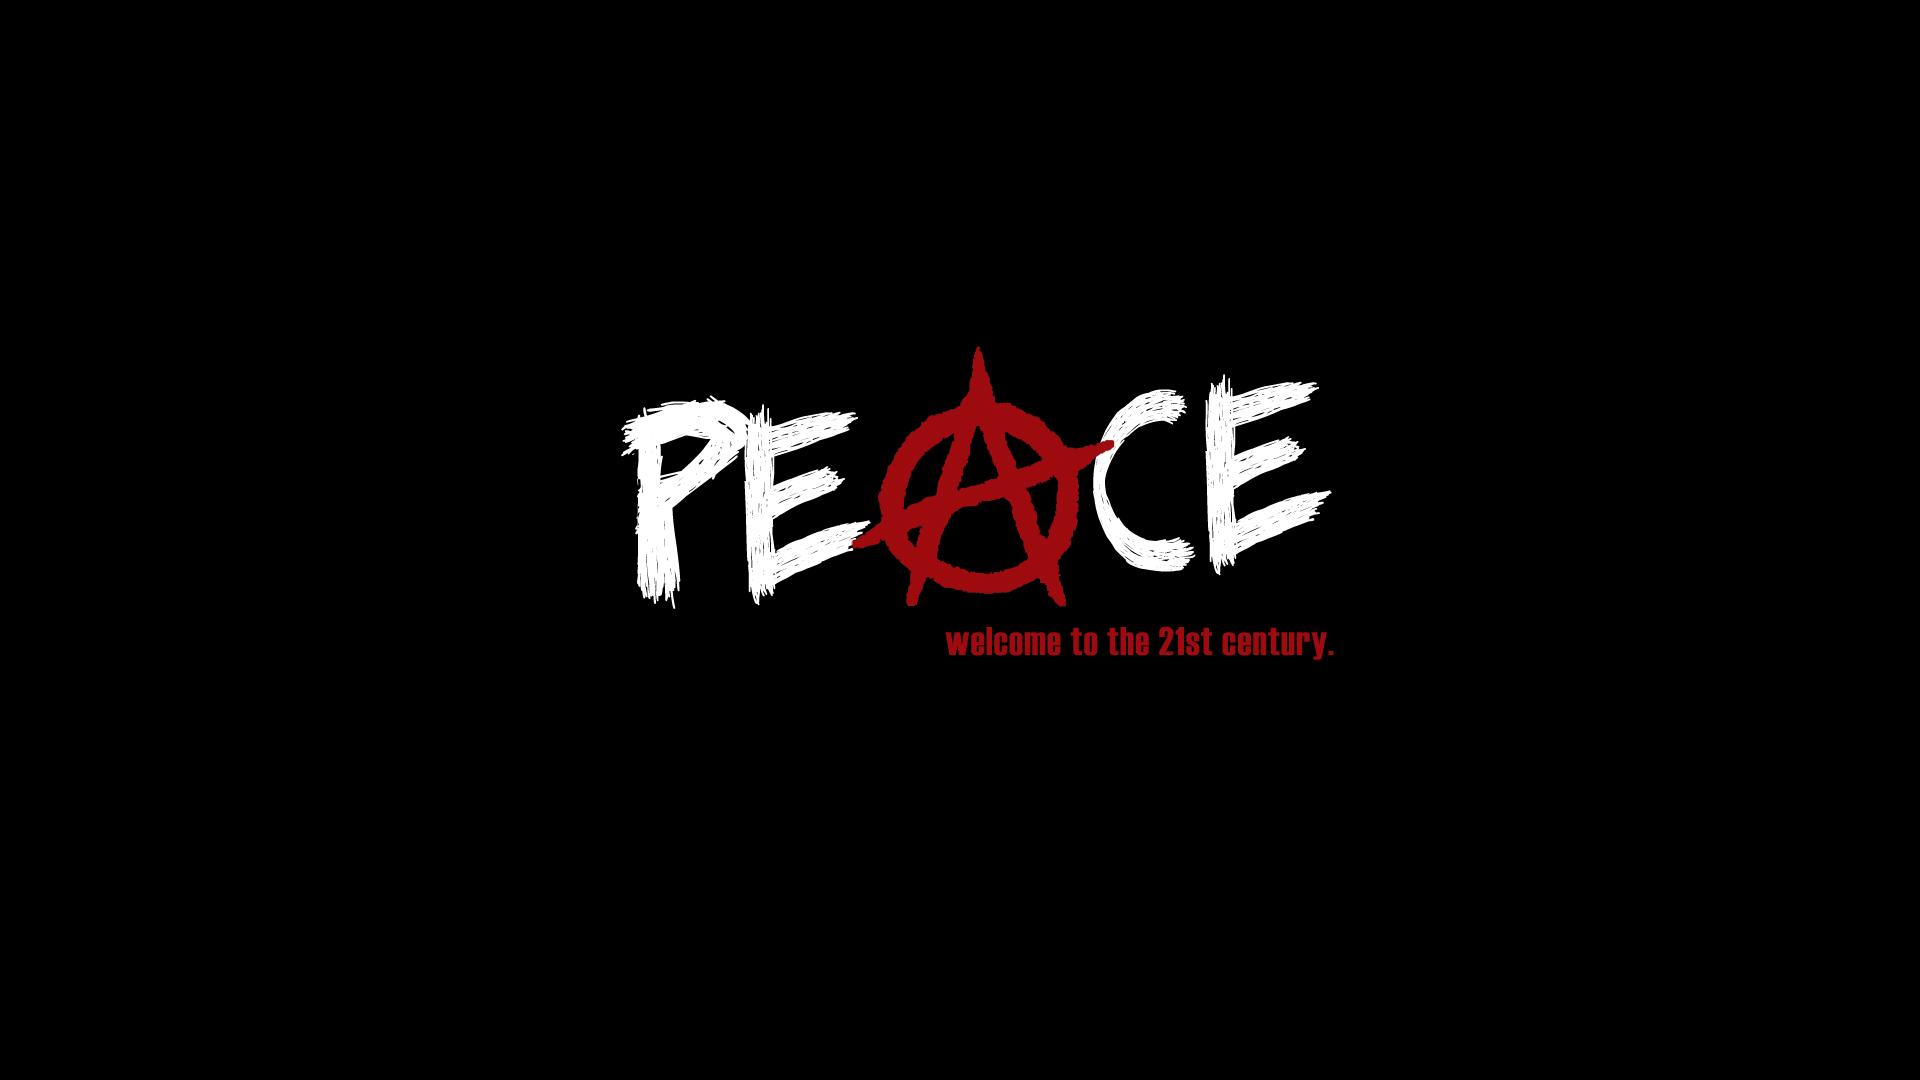 Dark anarchy peace urban wallpaper 1920x1080 29391 WallpaperUP 1920x1080